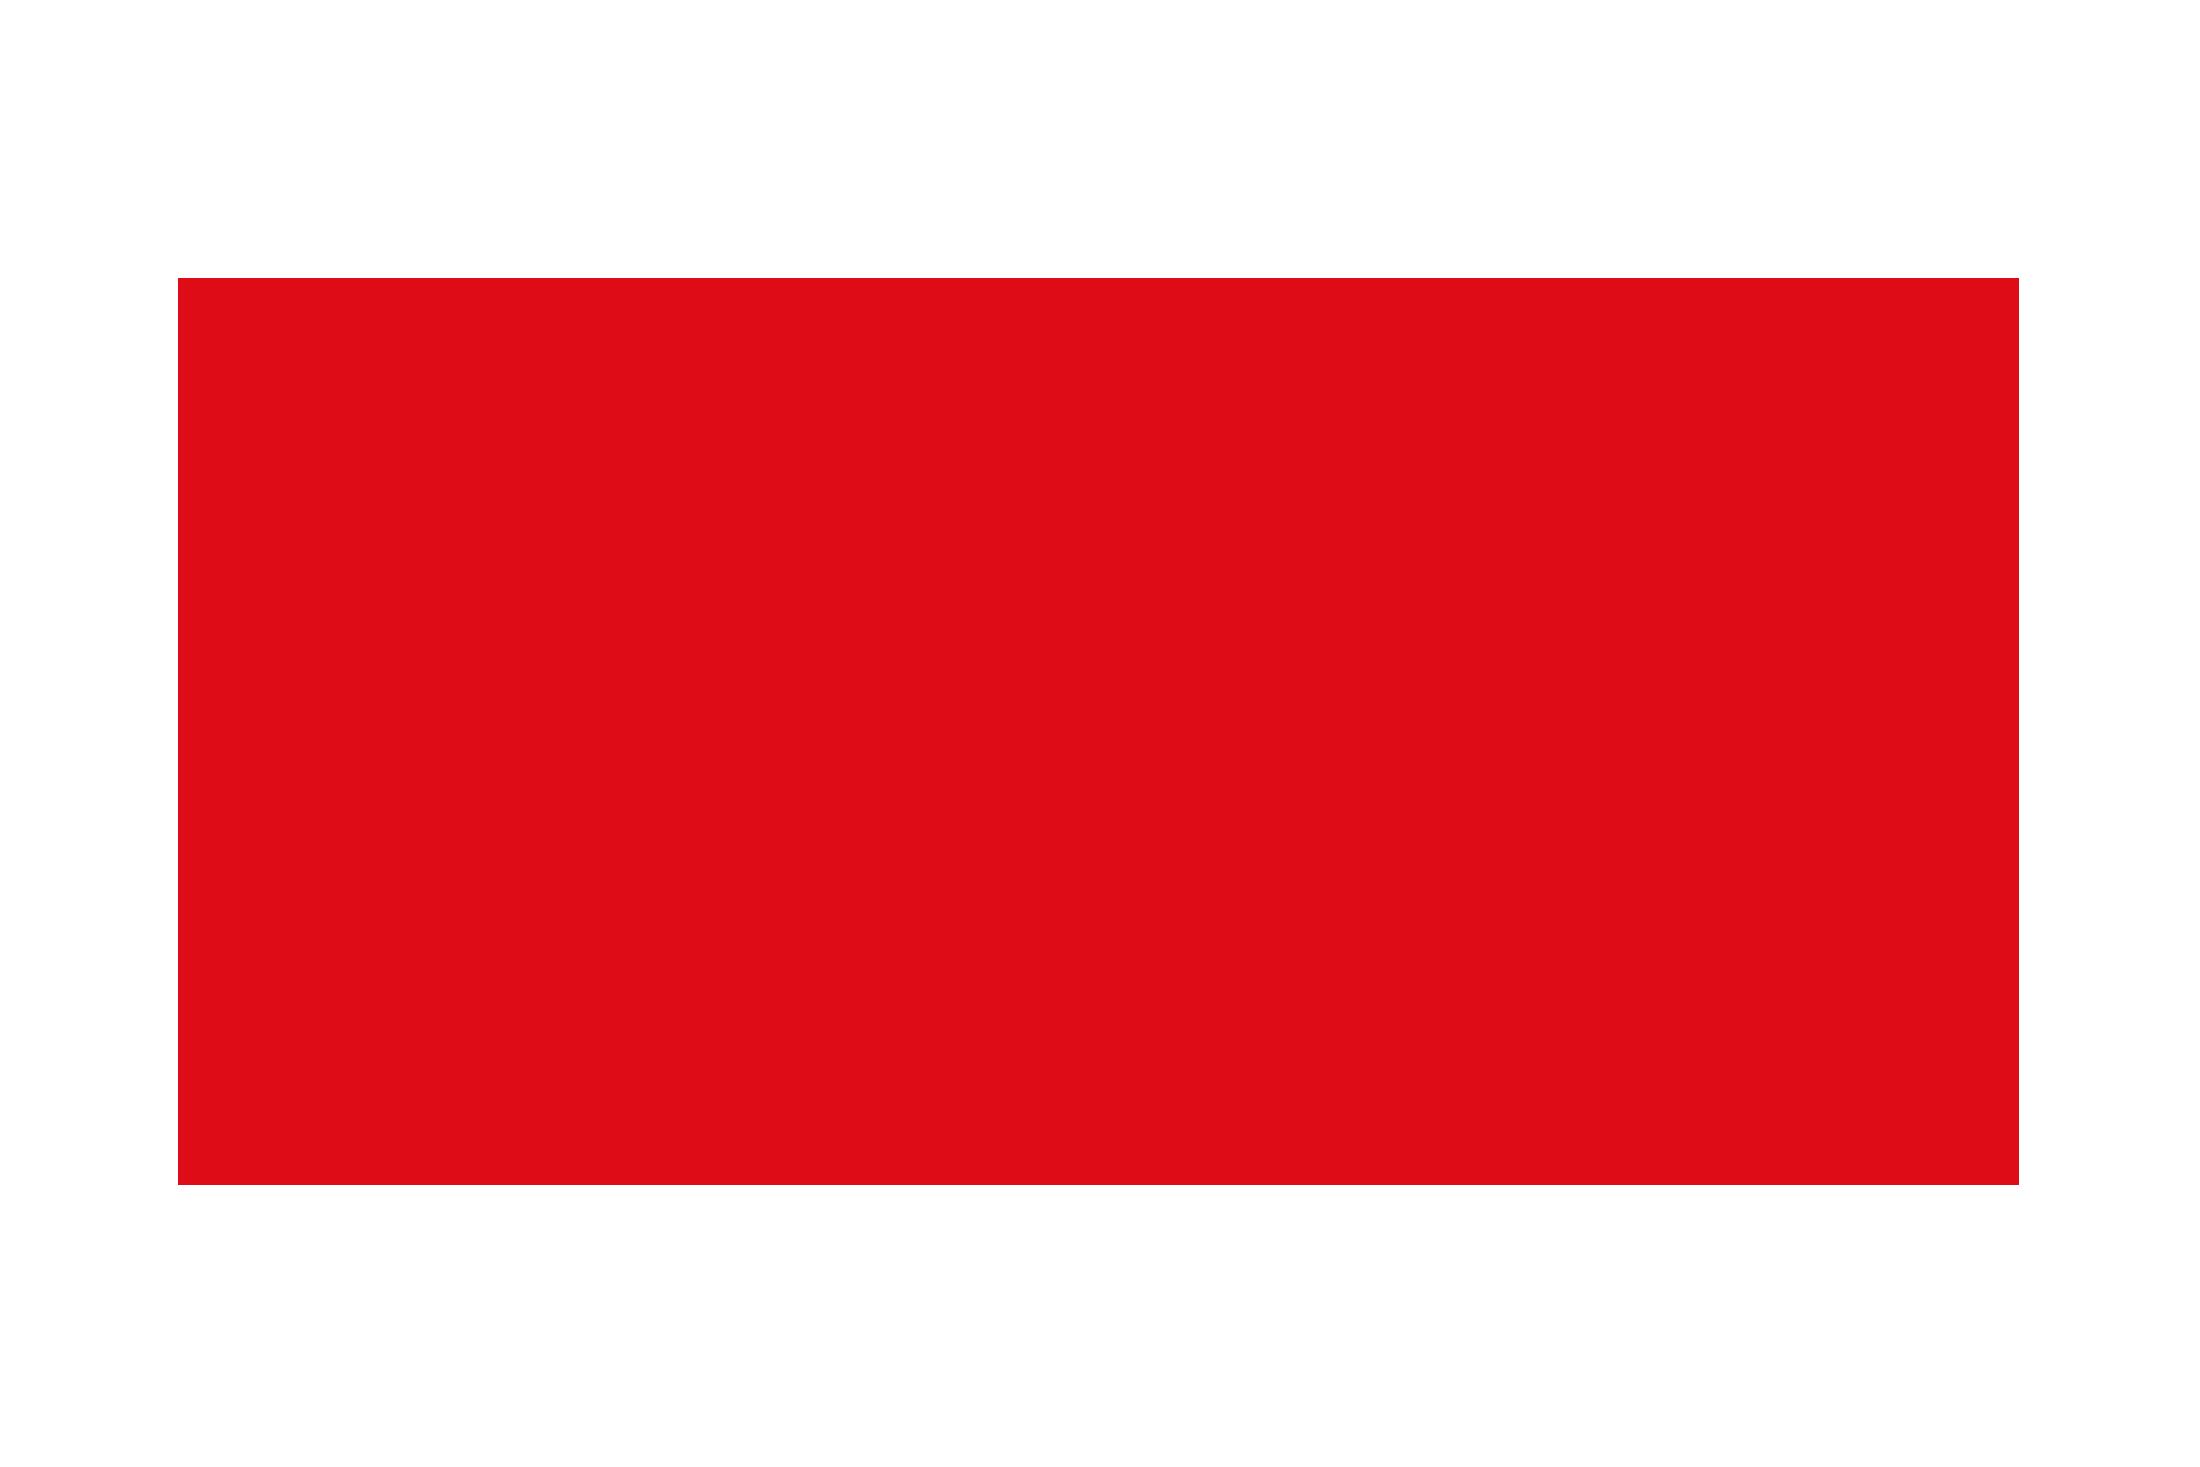 Grunge myth label PSD